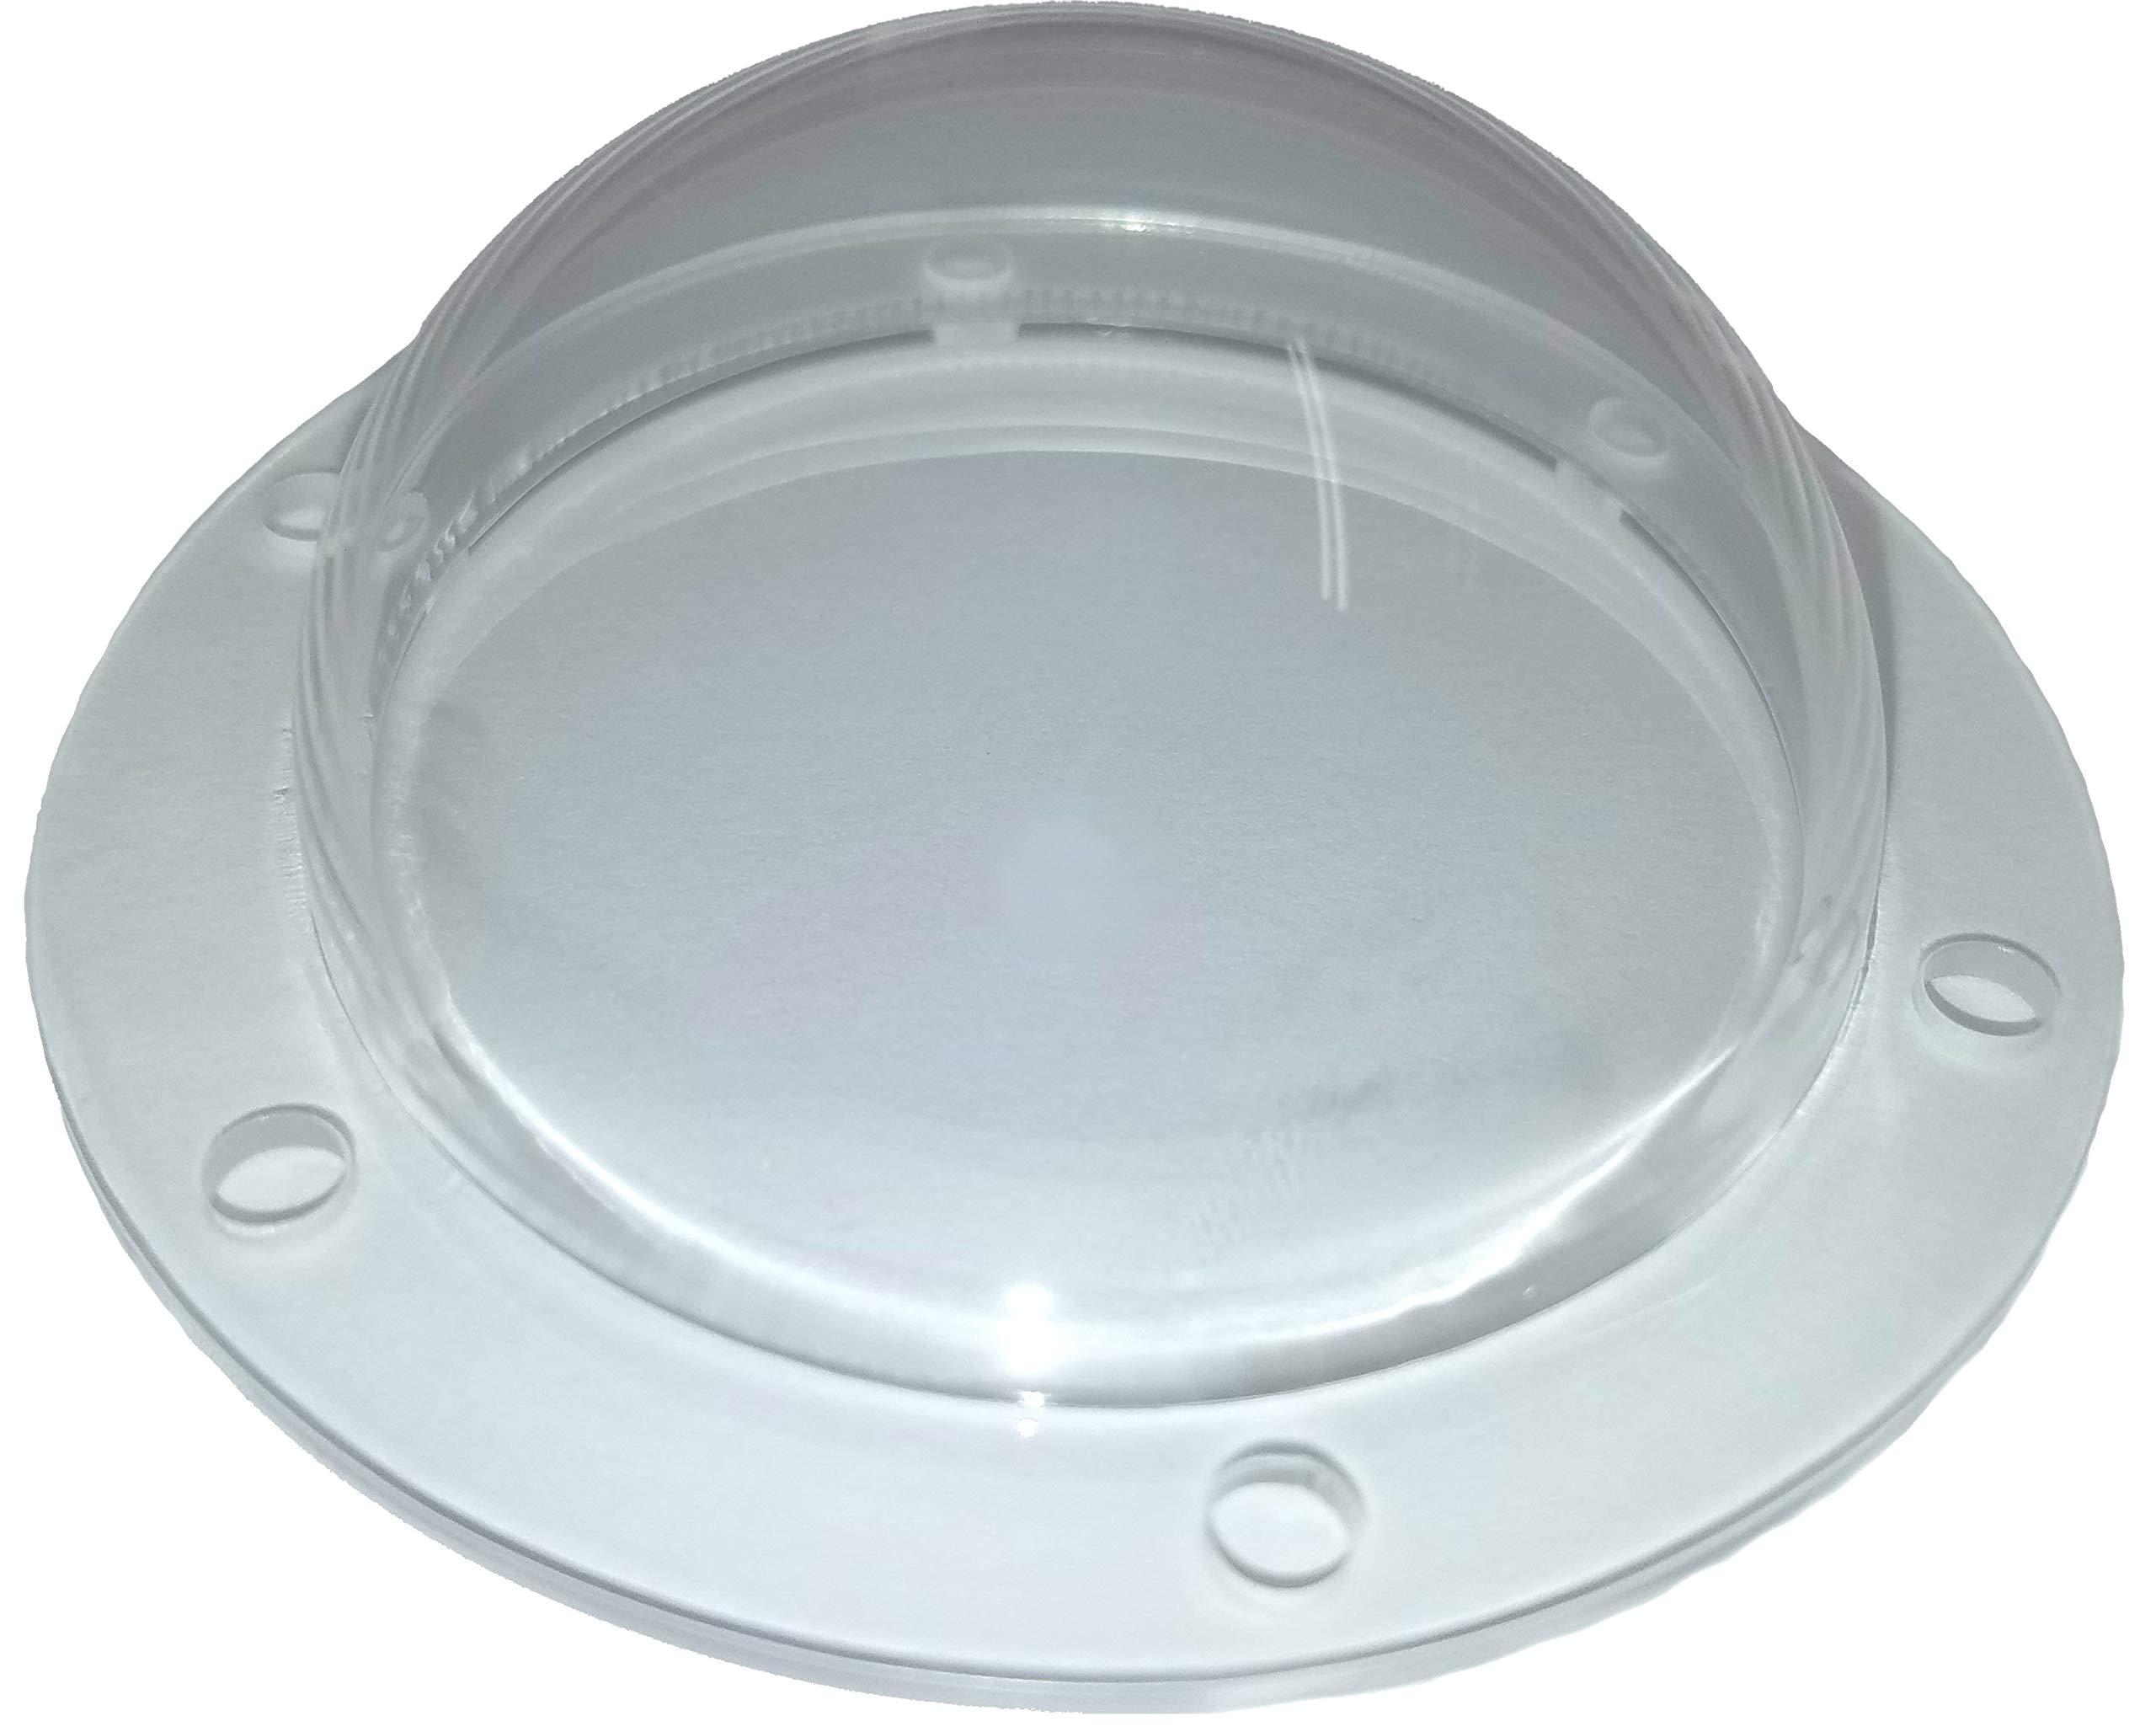 SupremeTech Acrylic Dome/Plastic Hemisphere - Clear